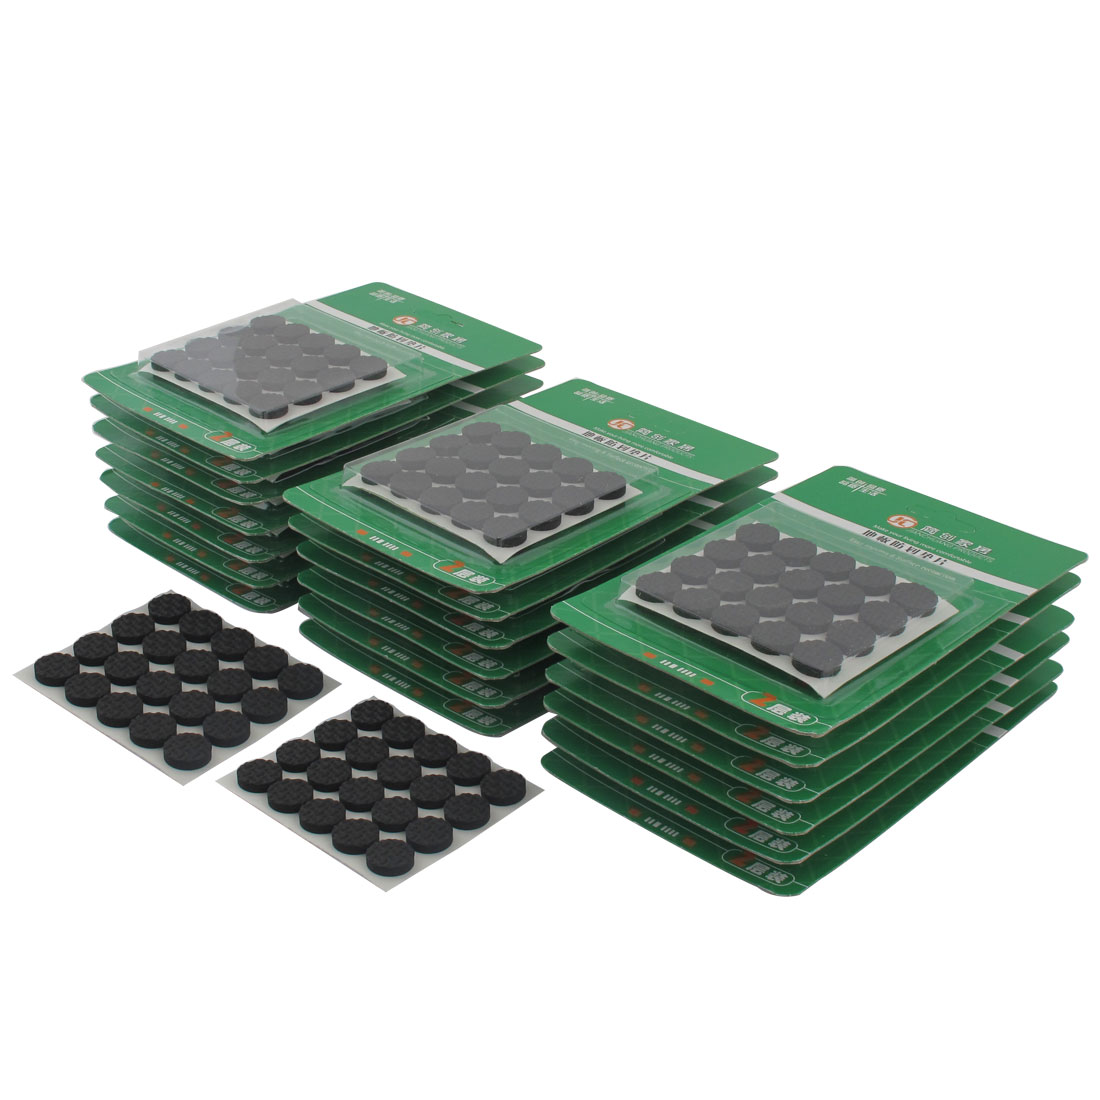 Household Round EVA Self Adhesive Table Cabinet Furniture Felt Pads Mats Black 15mm Diameter 800pcs